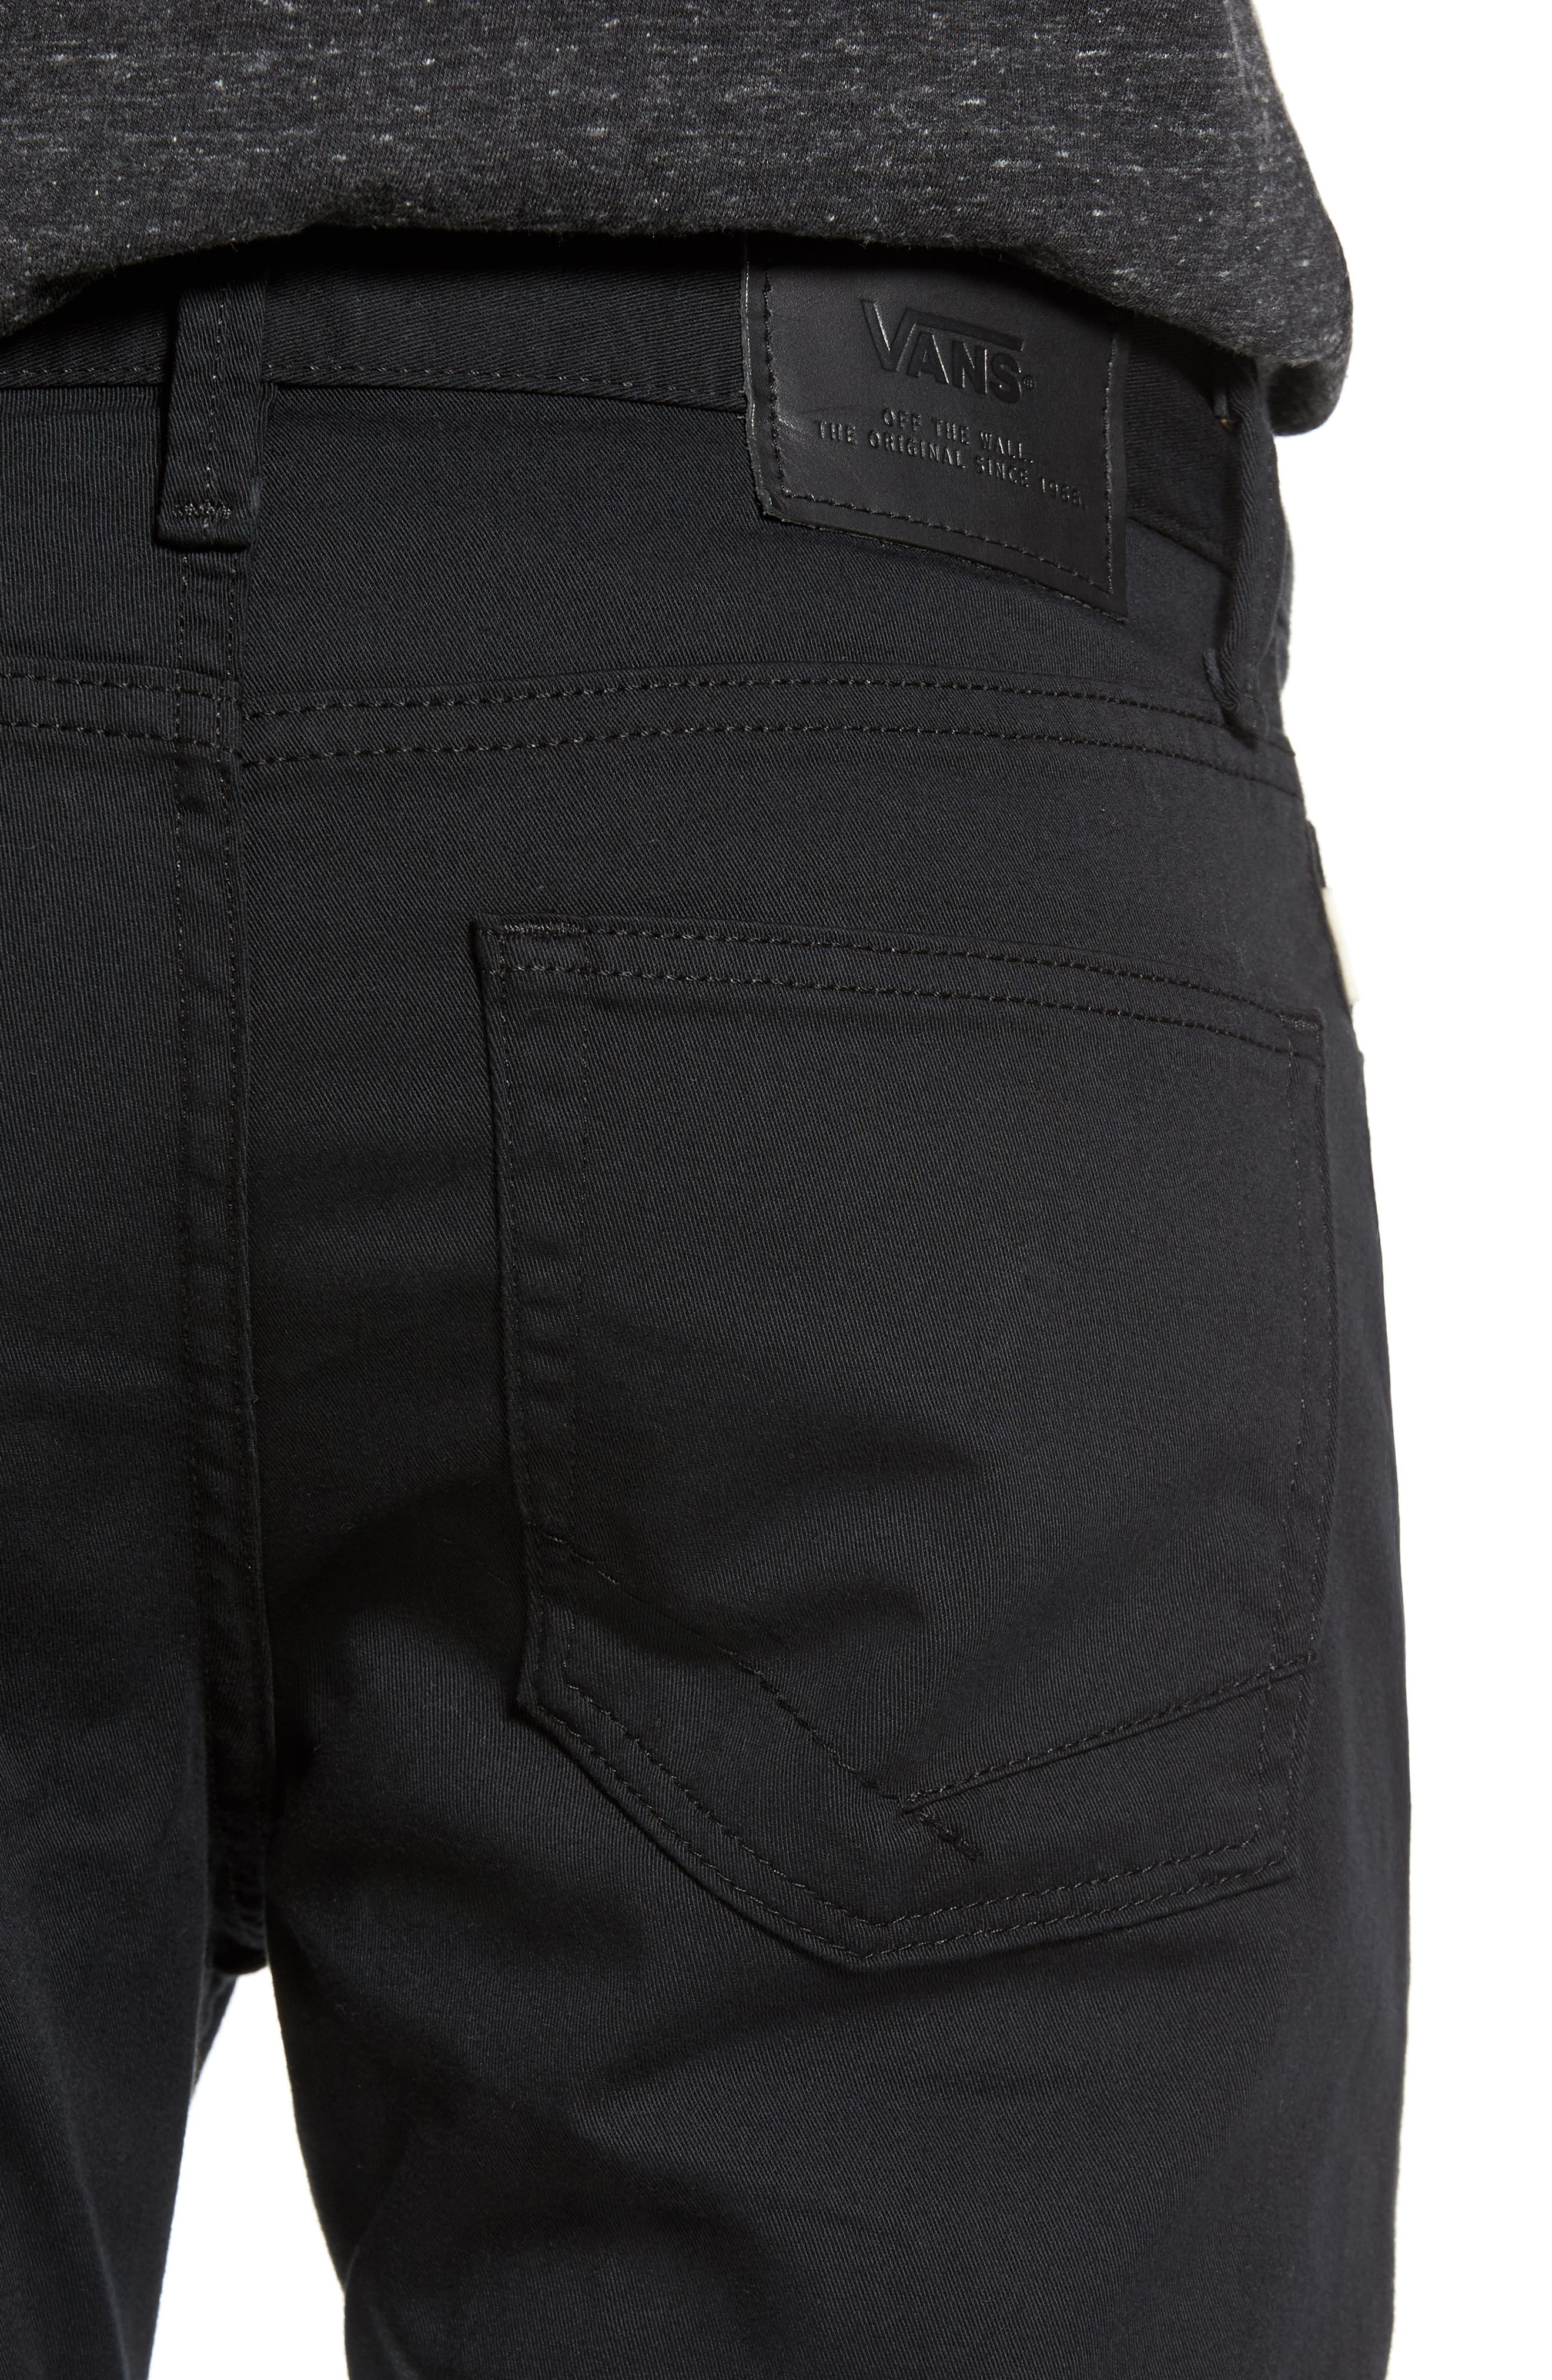 V56 Covina II Slim Fit Pants,                             Alternate thumbnail 13, color,